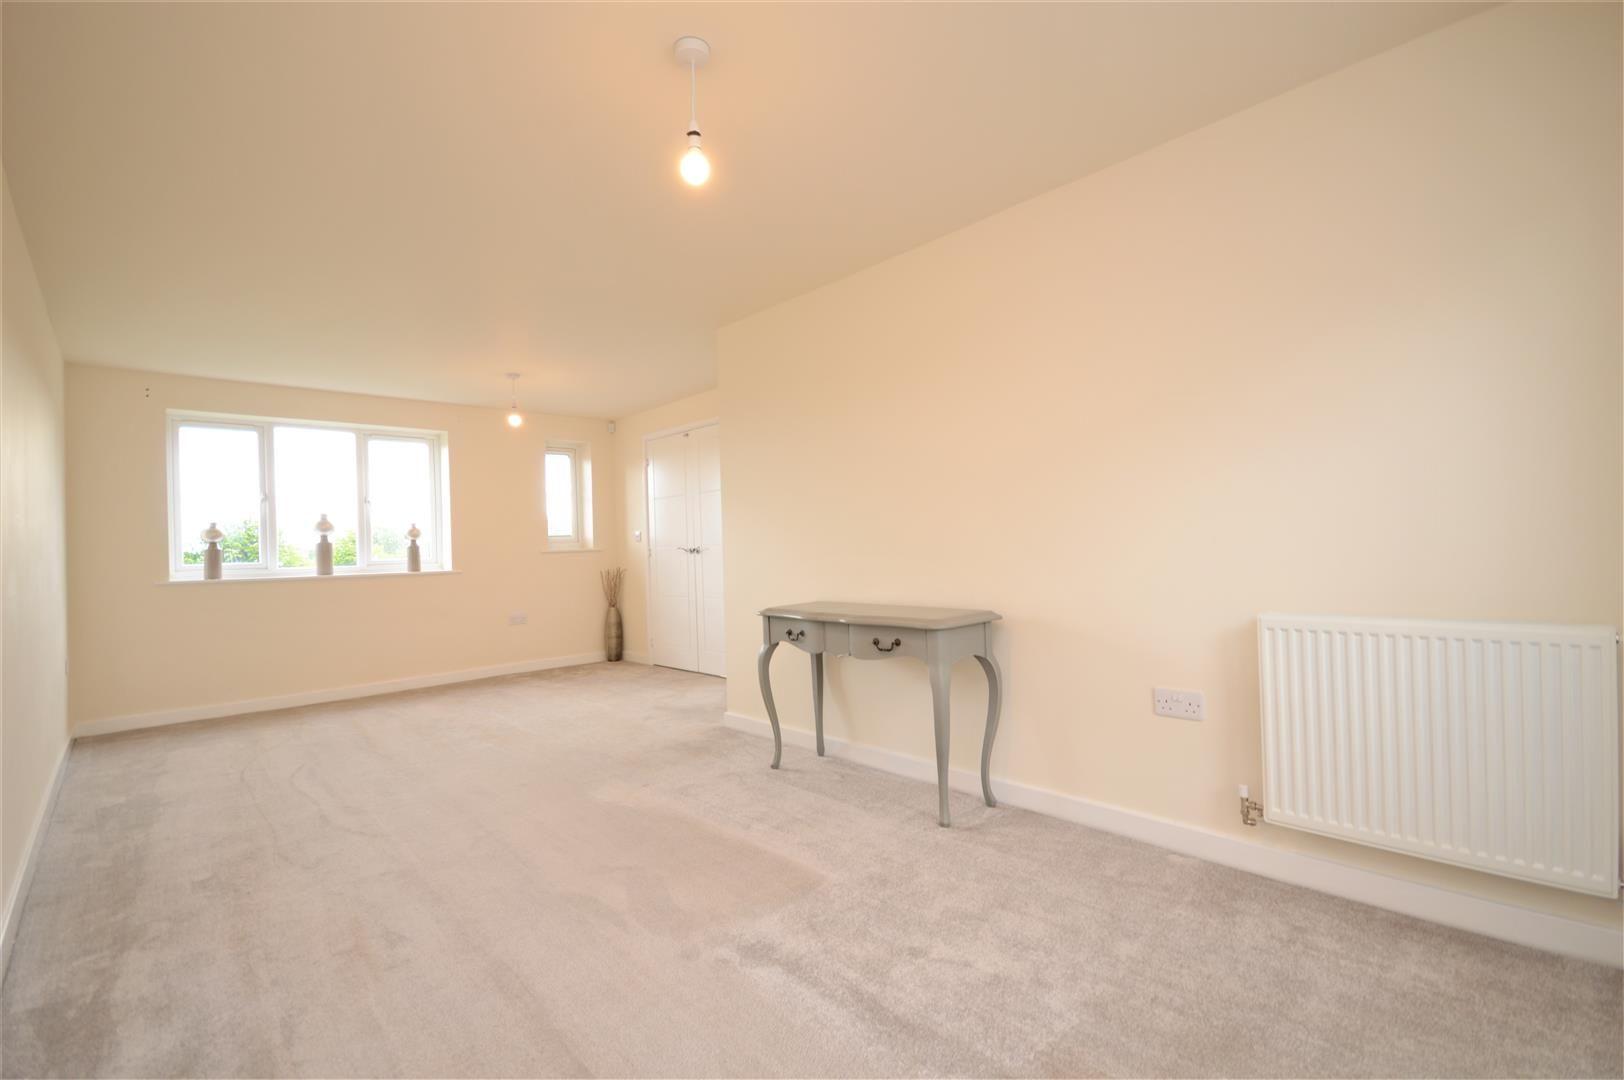 4 bed detached for sale in Bartestree  - Property Image 7